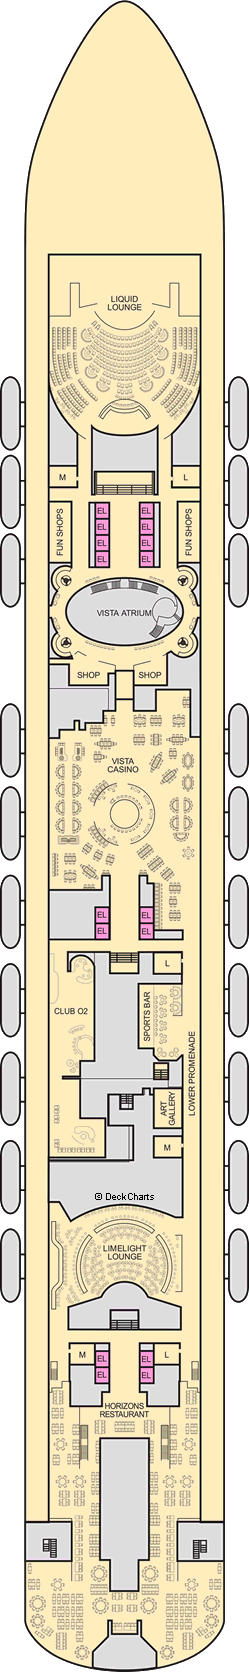 Carnival Vista: Mezzanine Deck